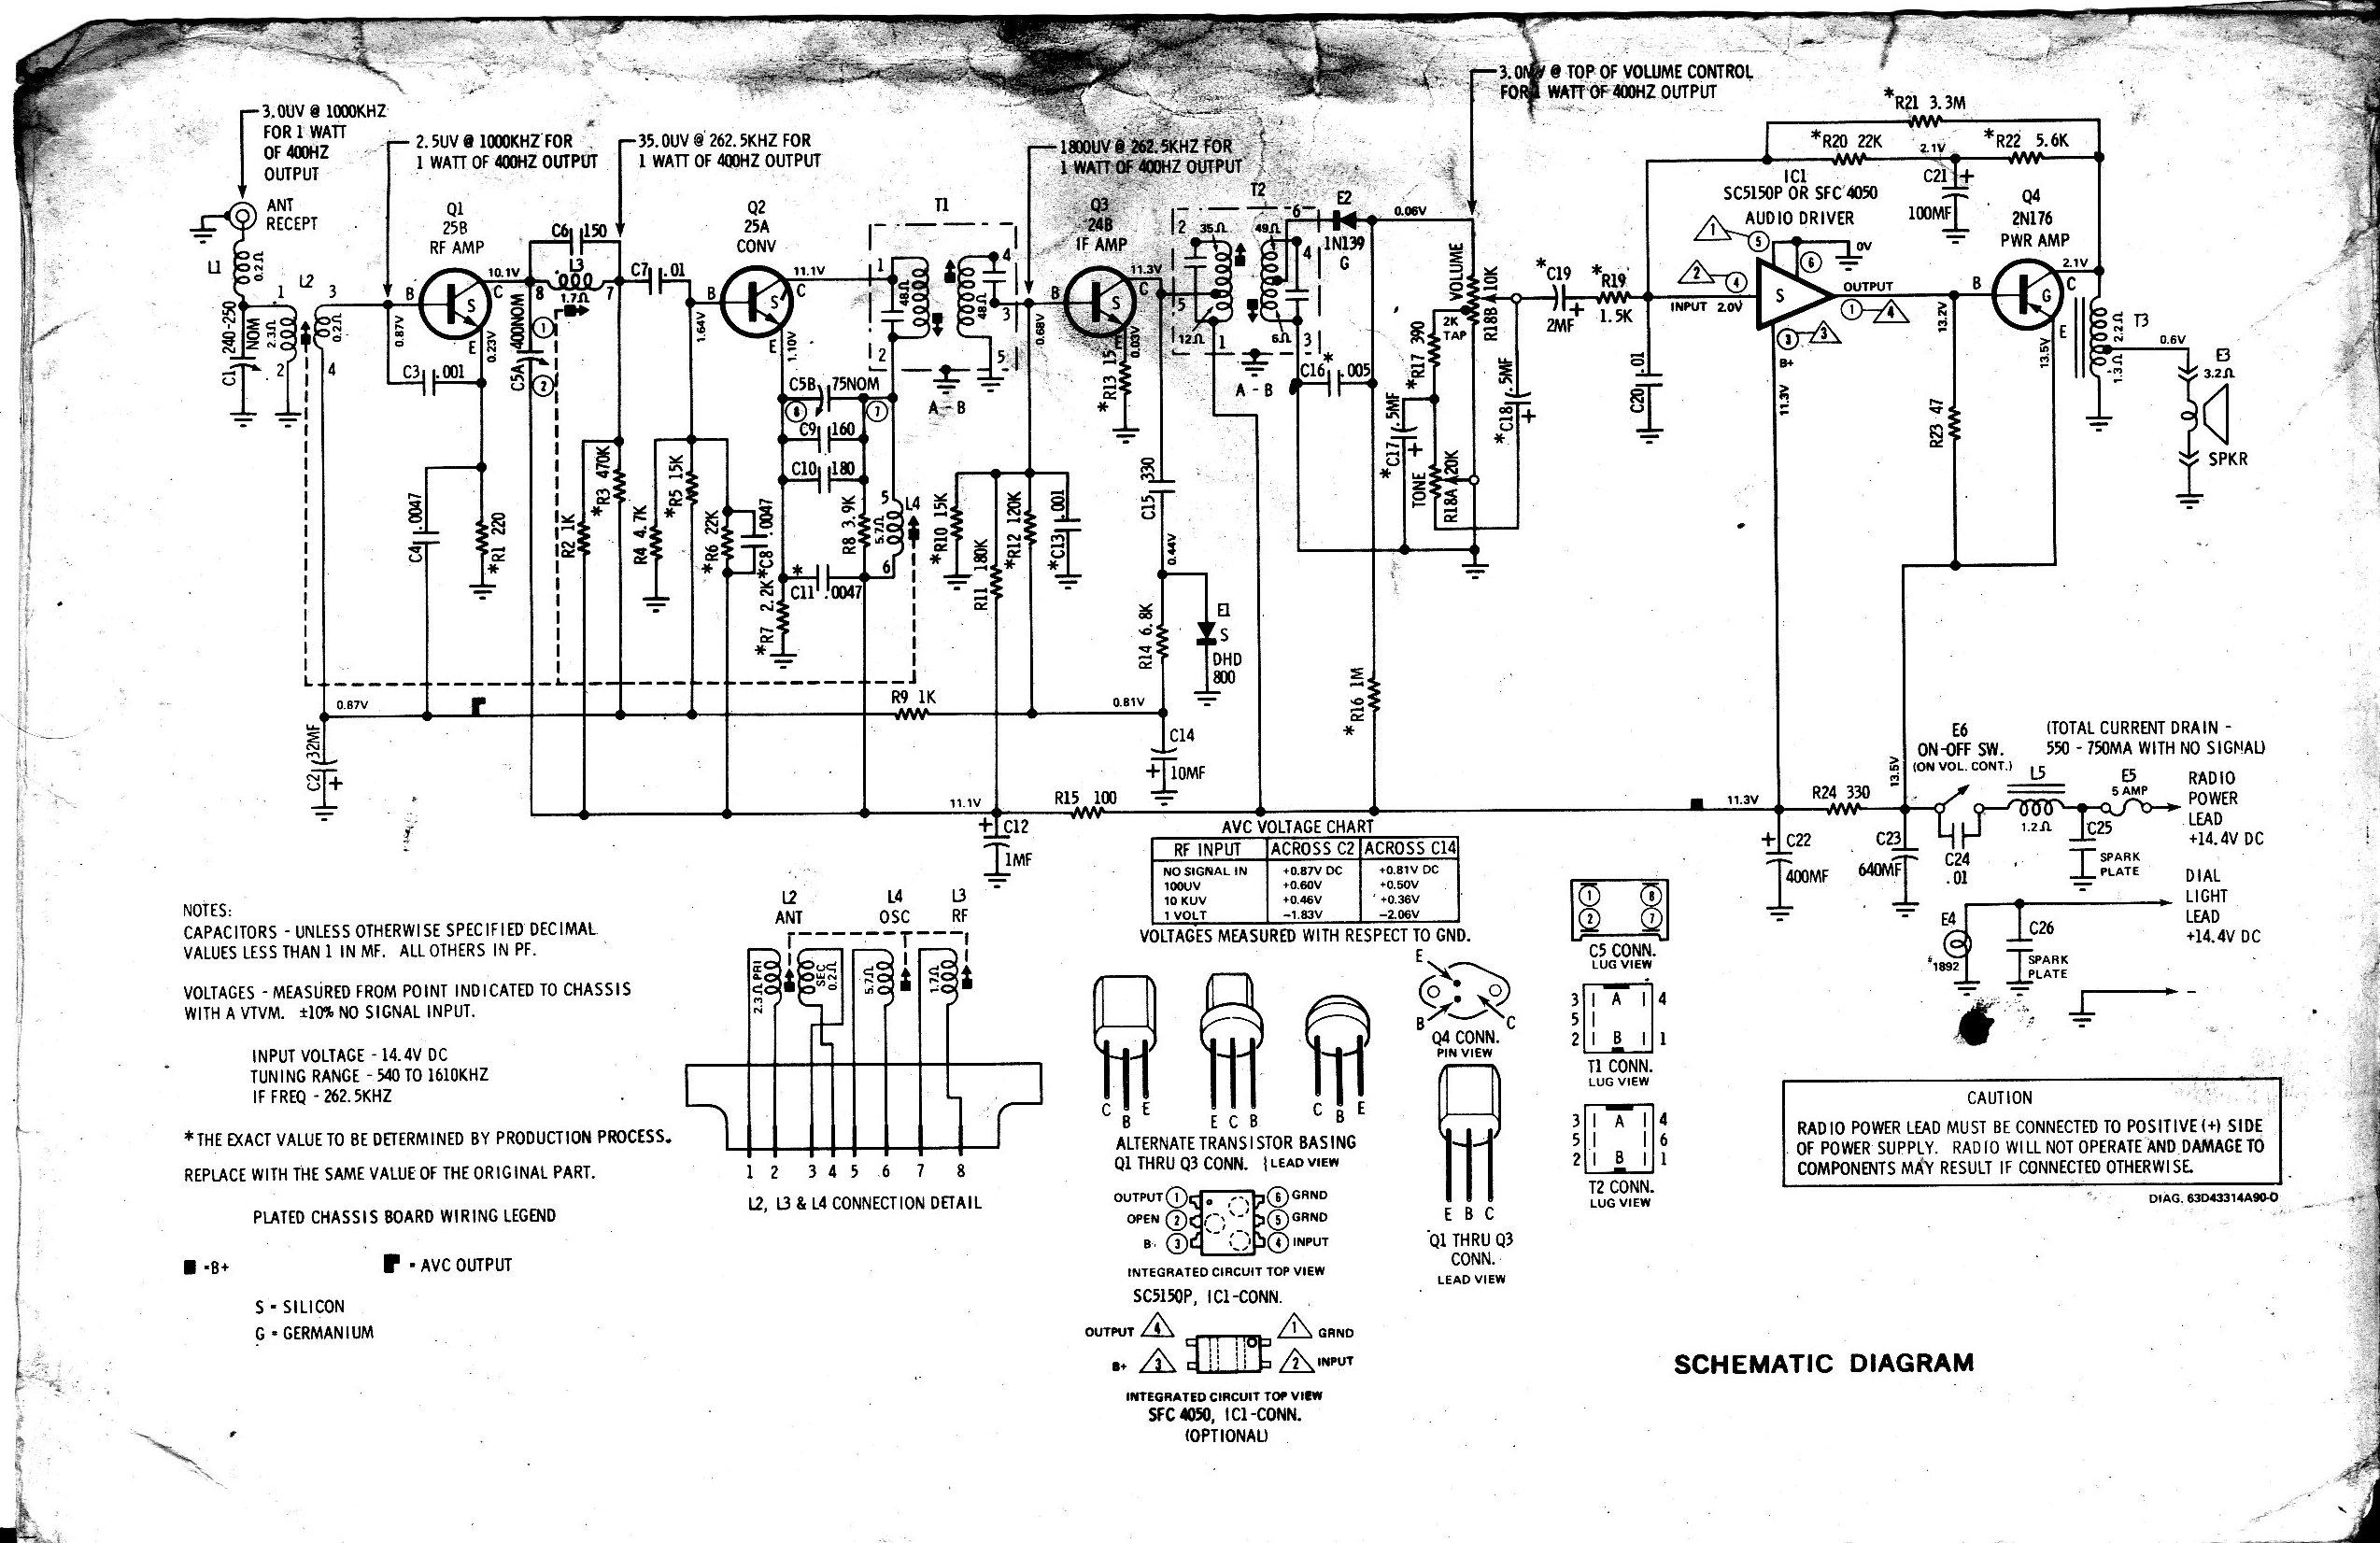 TheSamba.com :: Sapphire XV Owner's Manual